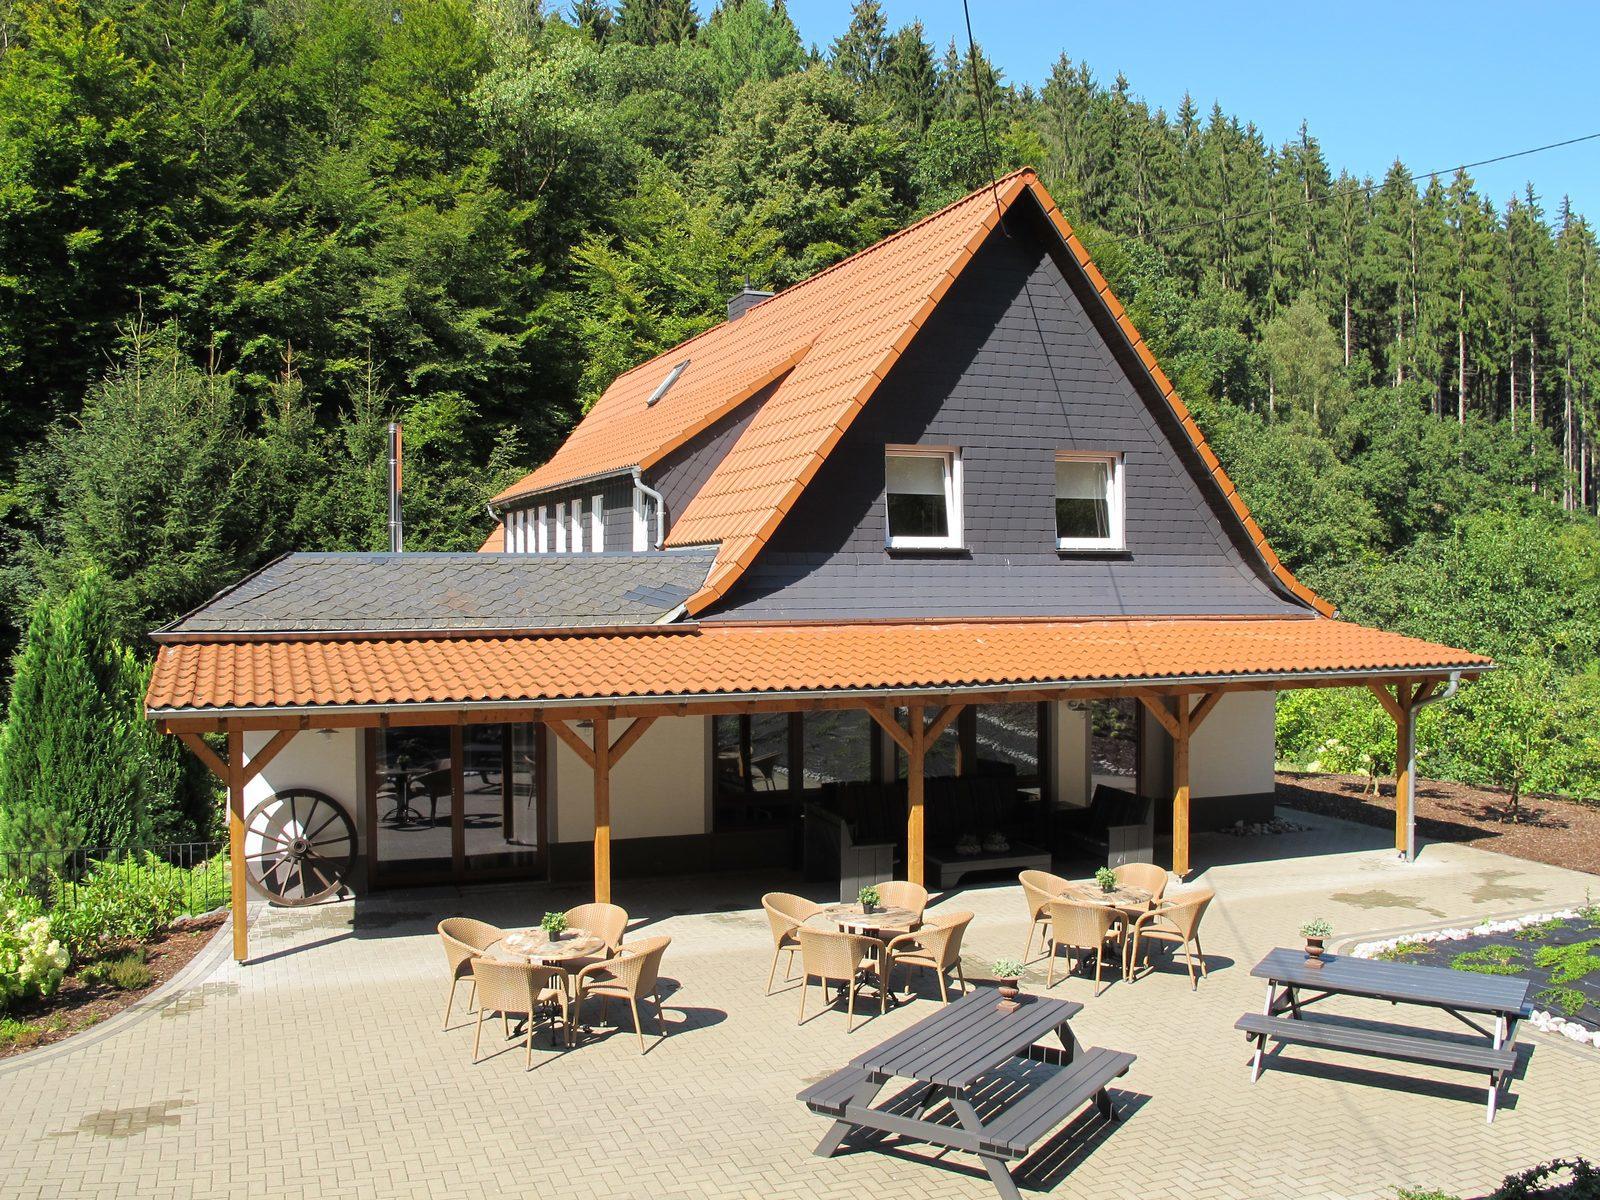 Duitsland, Westerwald, Schutzbach, vakantievilla, groepen, weekendje weg, luxe, jacuzzi, sauna, wandelen